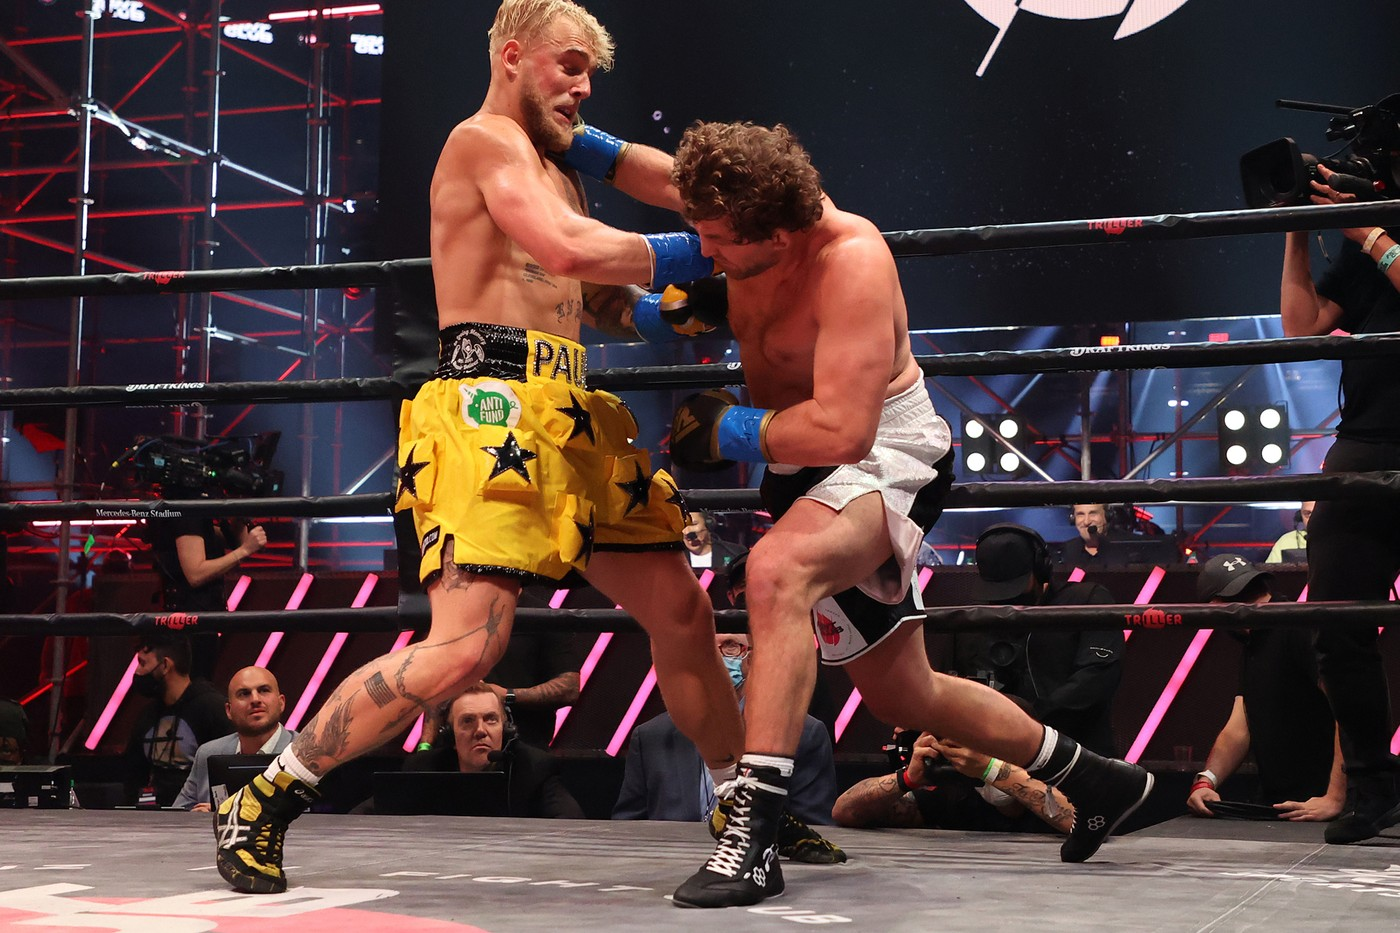 「网红拳击手」Jake Paul 于首回合 TKO 击倒前 MMA 好手 Ben Askren